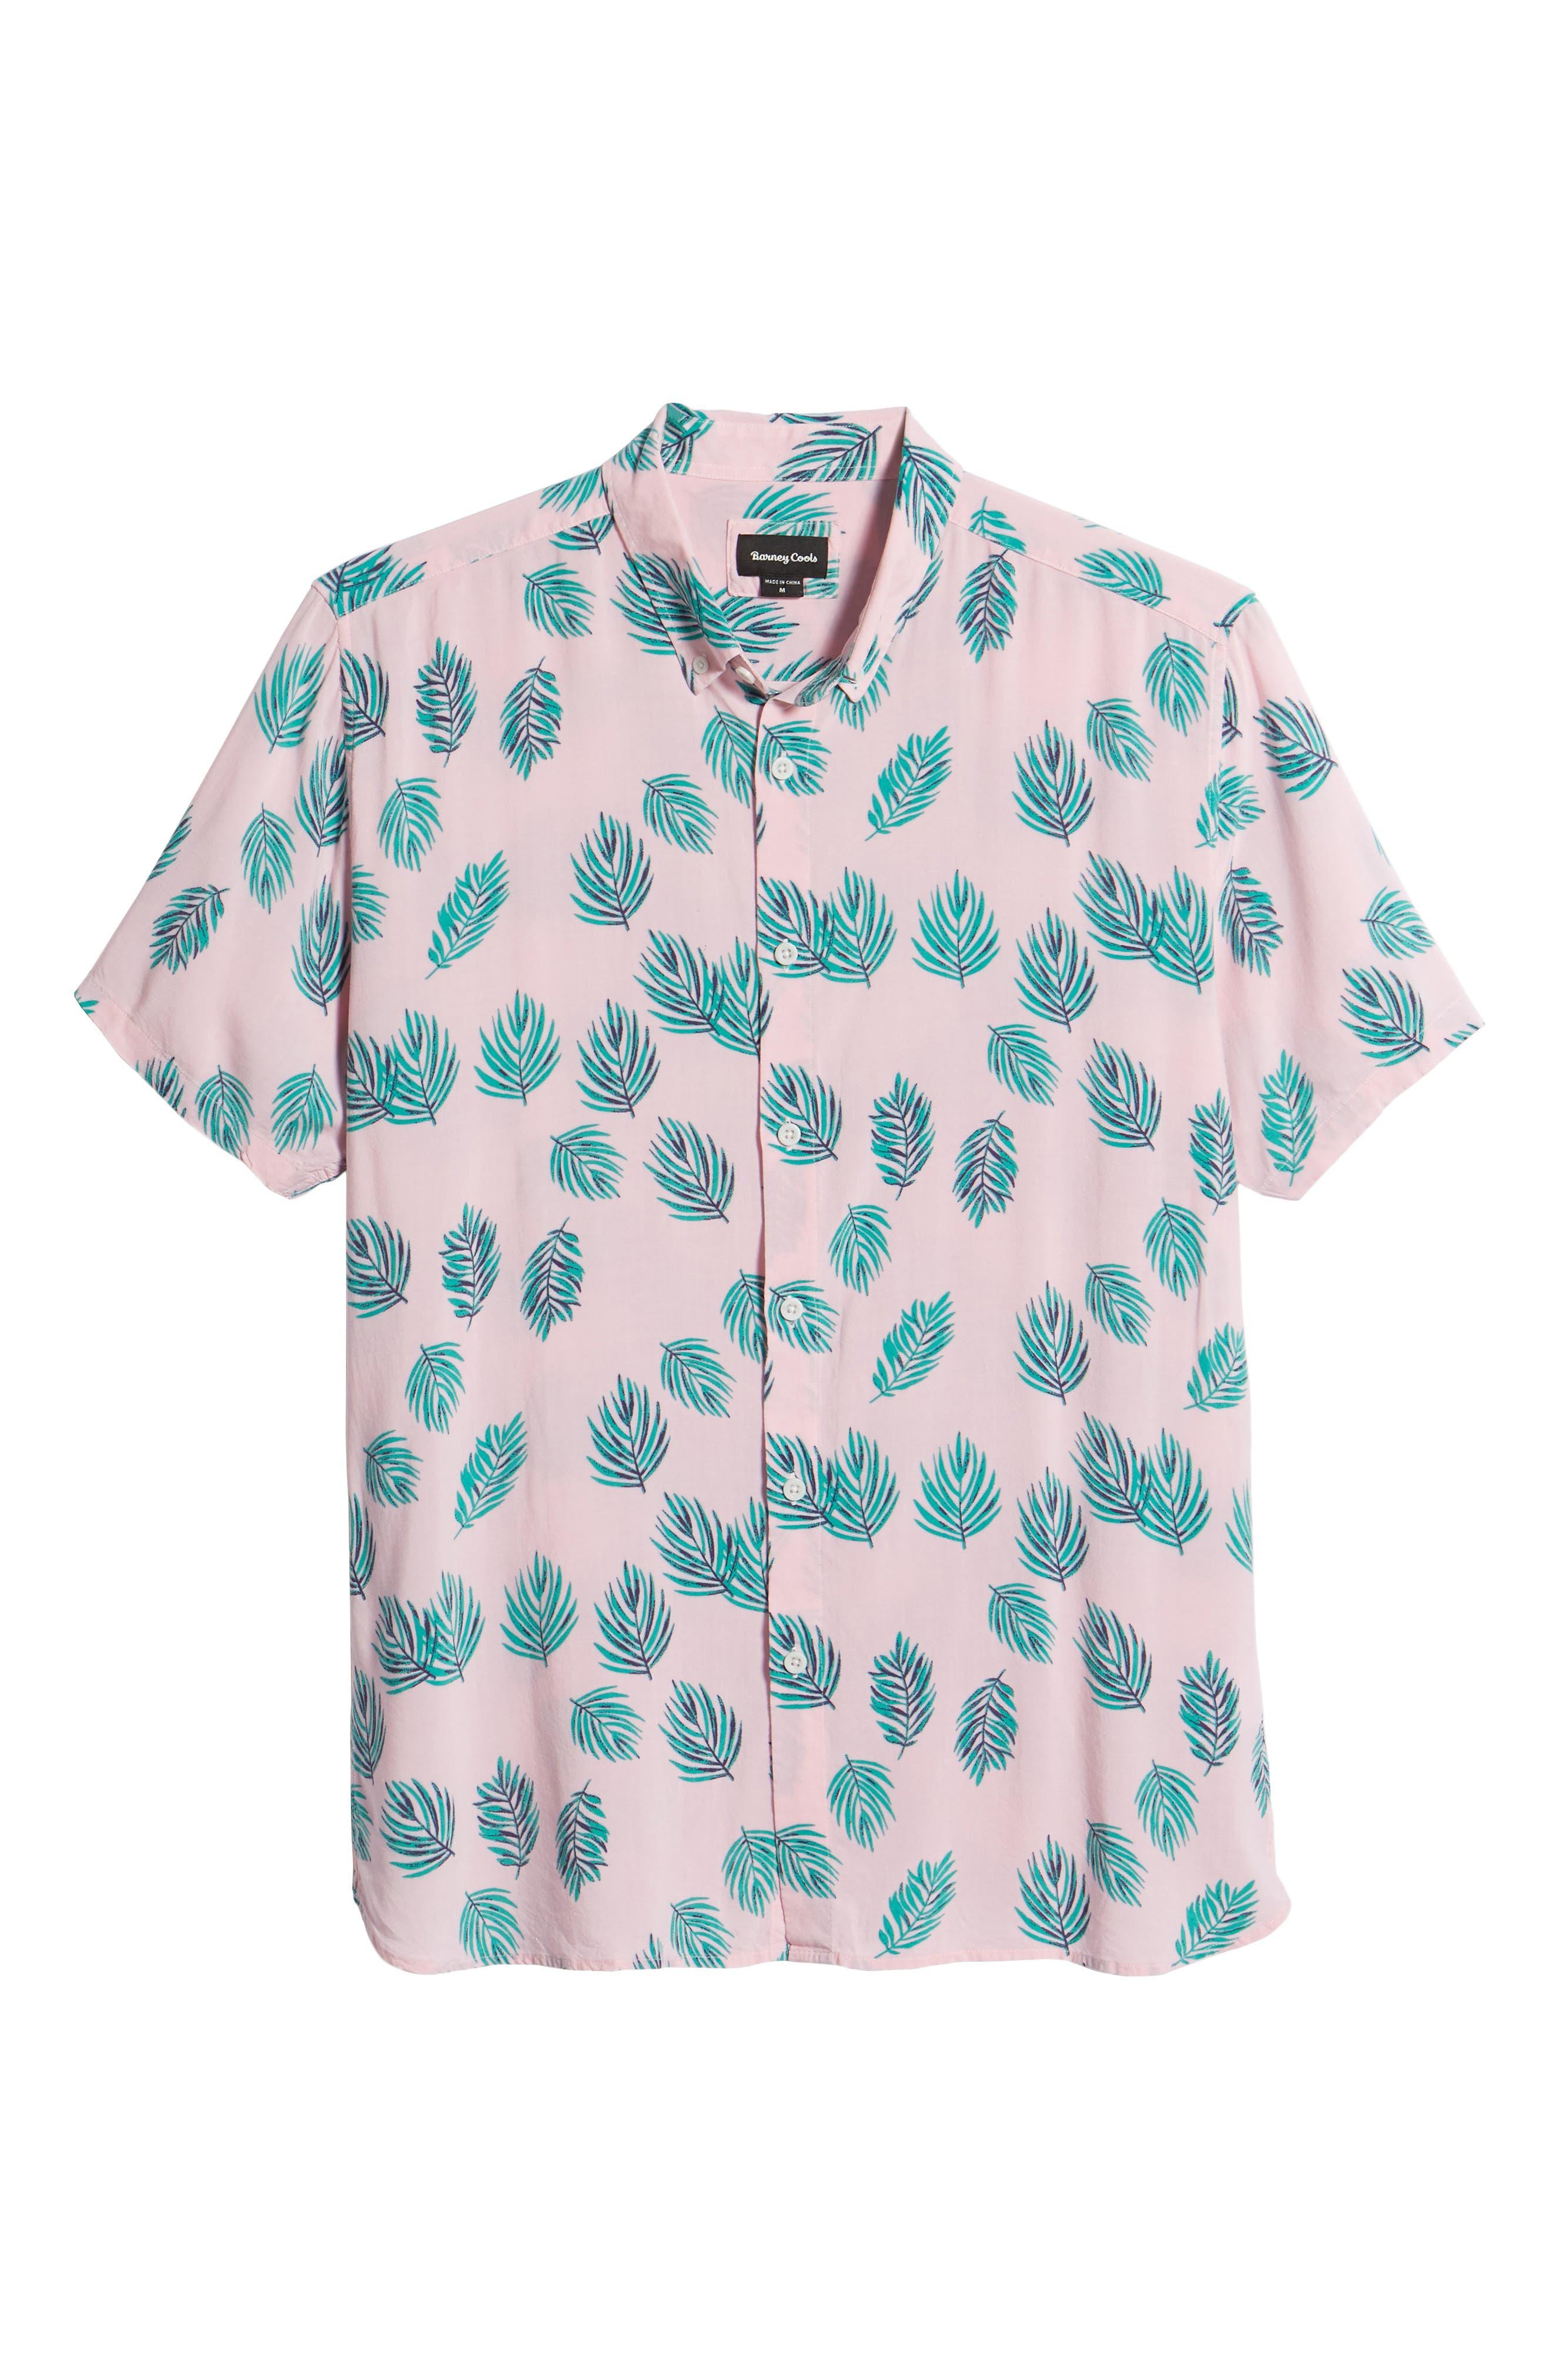 Holiday Woven Shirt,                             Alternate thumbnail 6, color,                             681